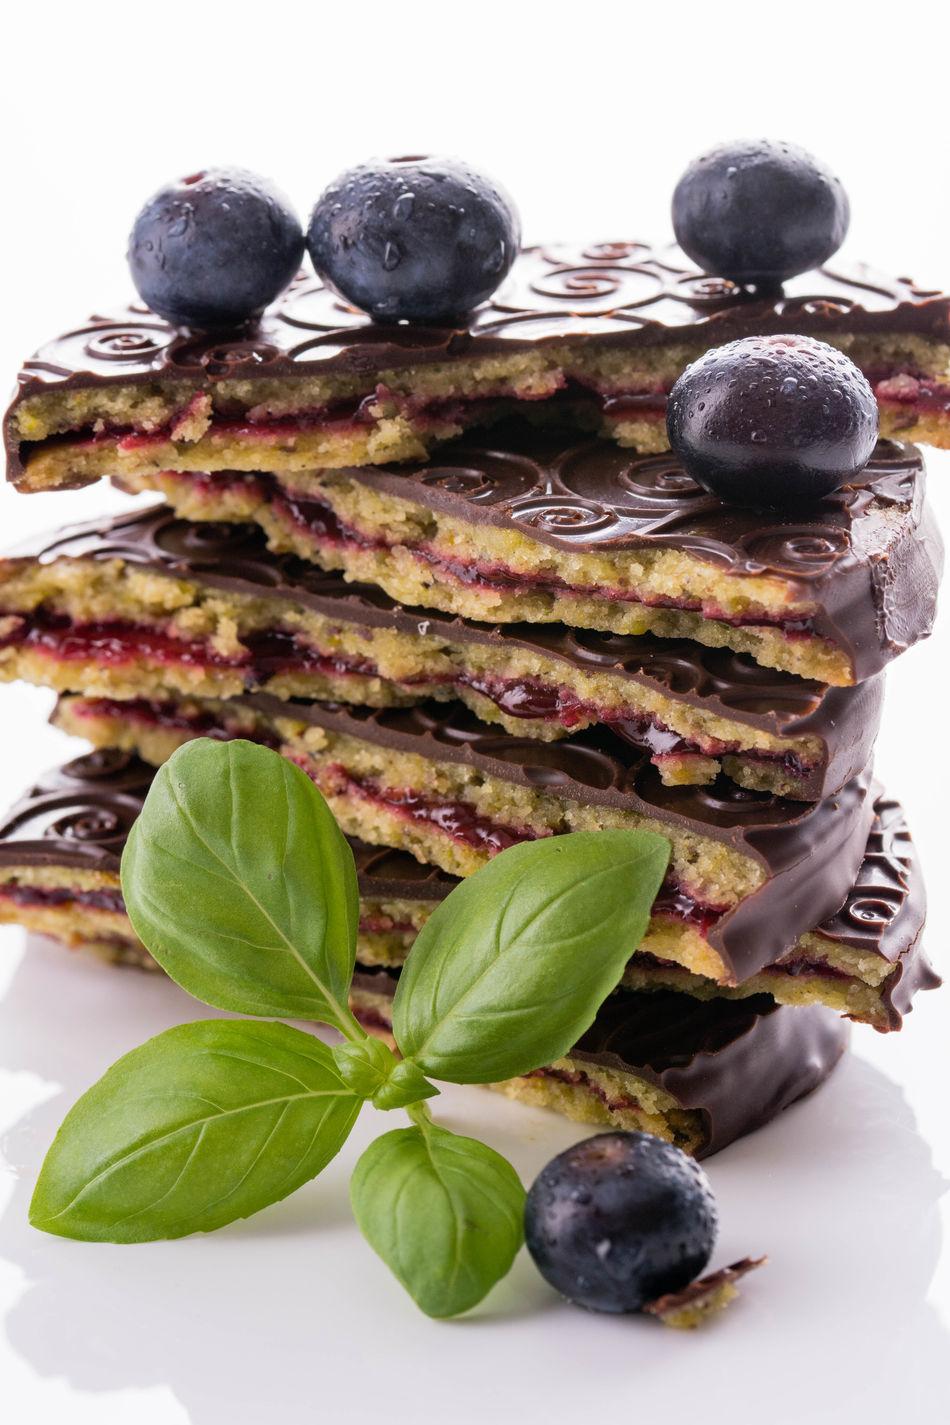 Cake Chokocake Dessert Food Studio Shot White Background